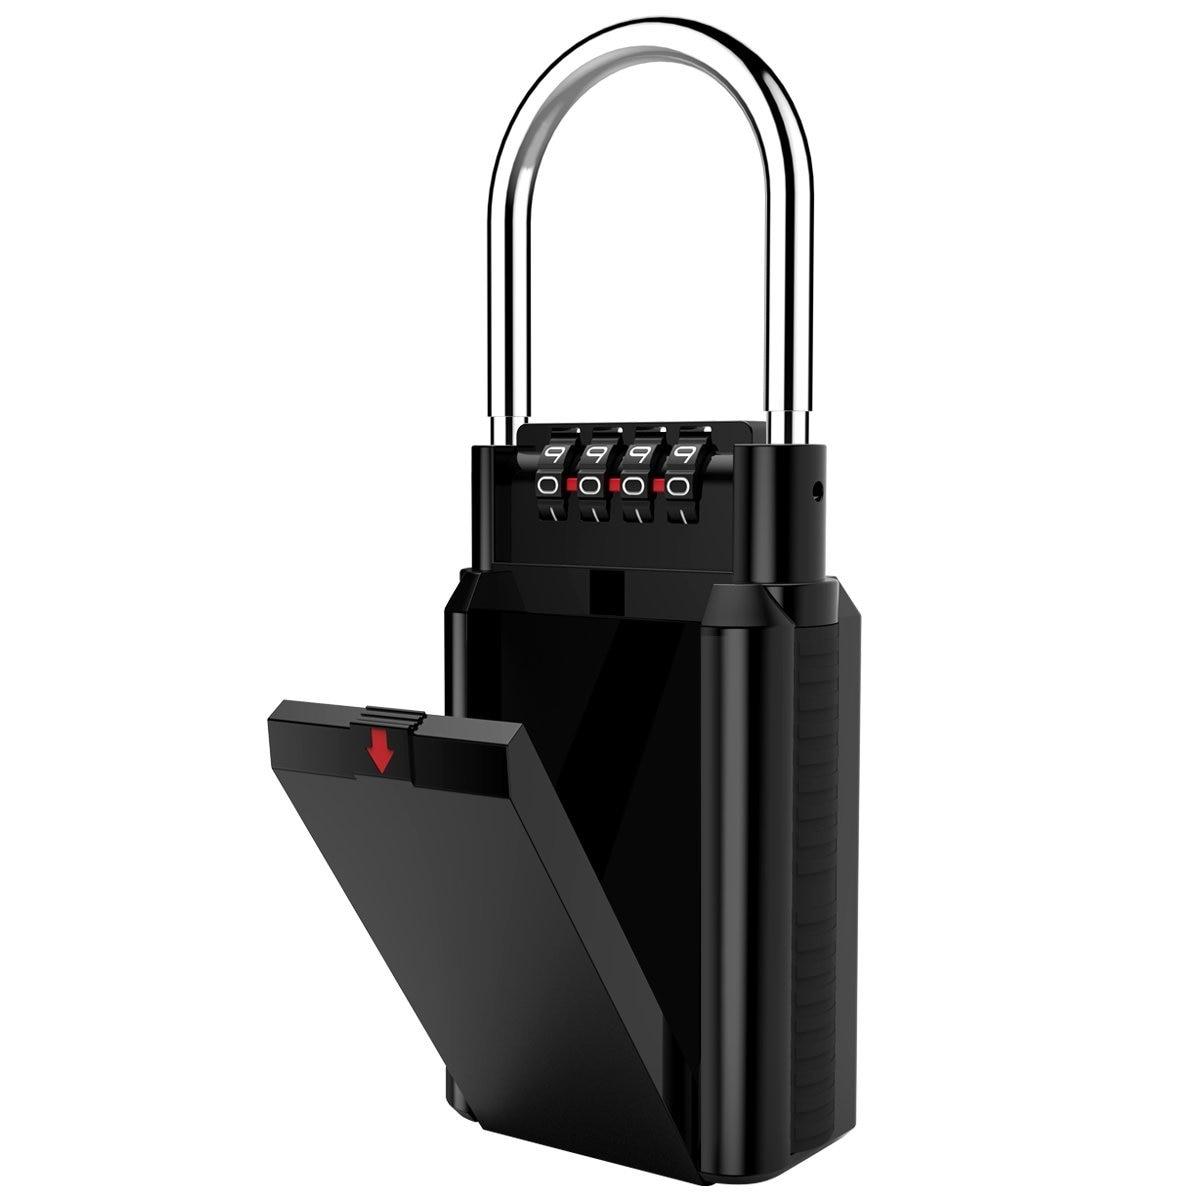 MOOL Combination Lock Box Key Storage Lock Box 4-Digit Combination Lock Waterproof Indoor/Outdoor(China)